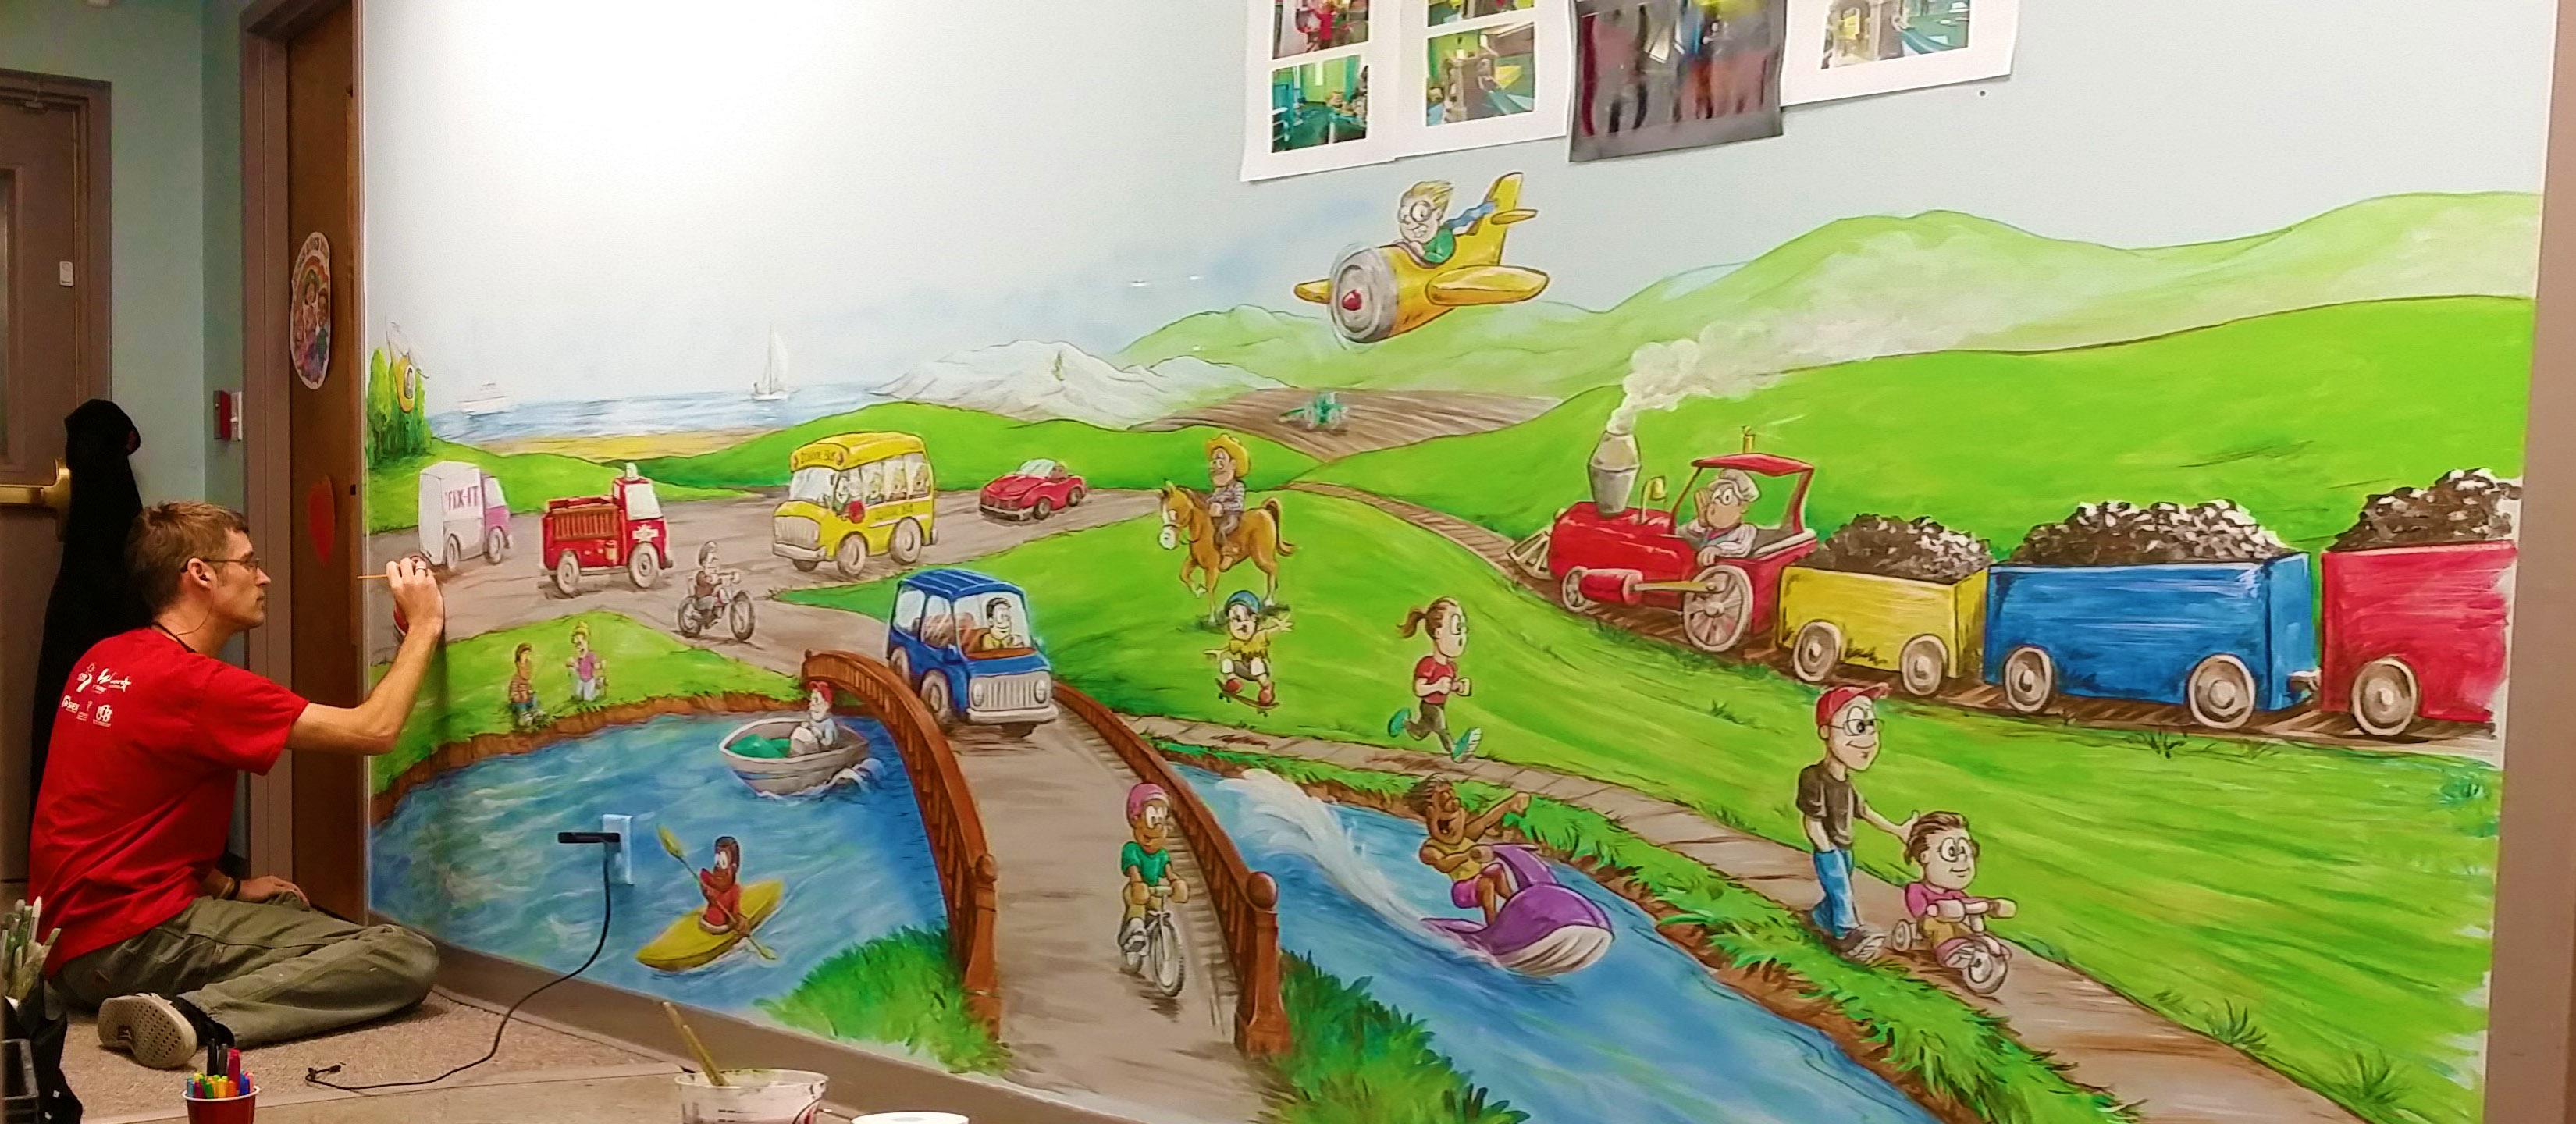 transportation mural painting